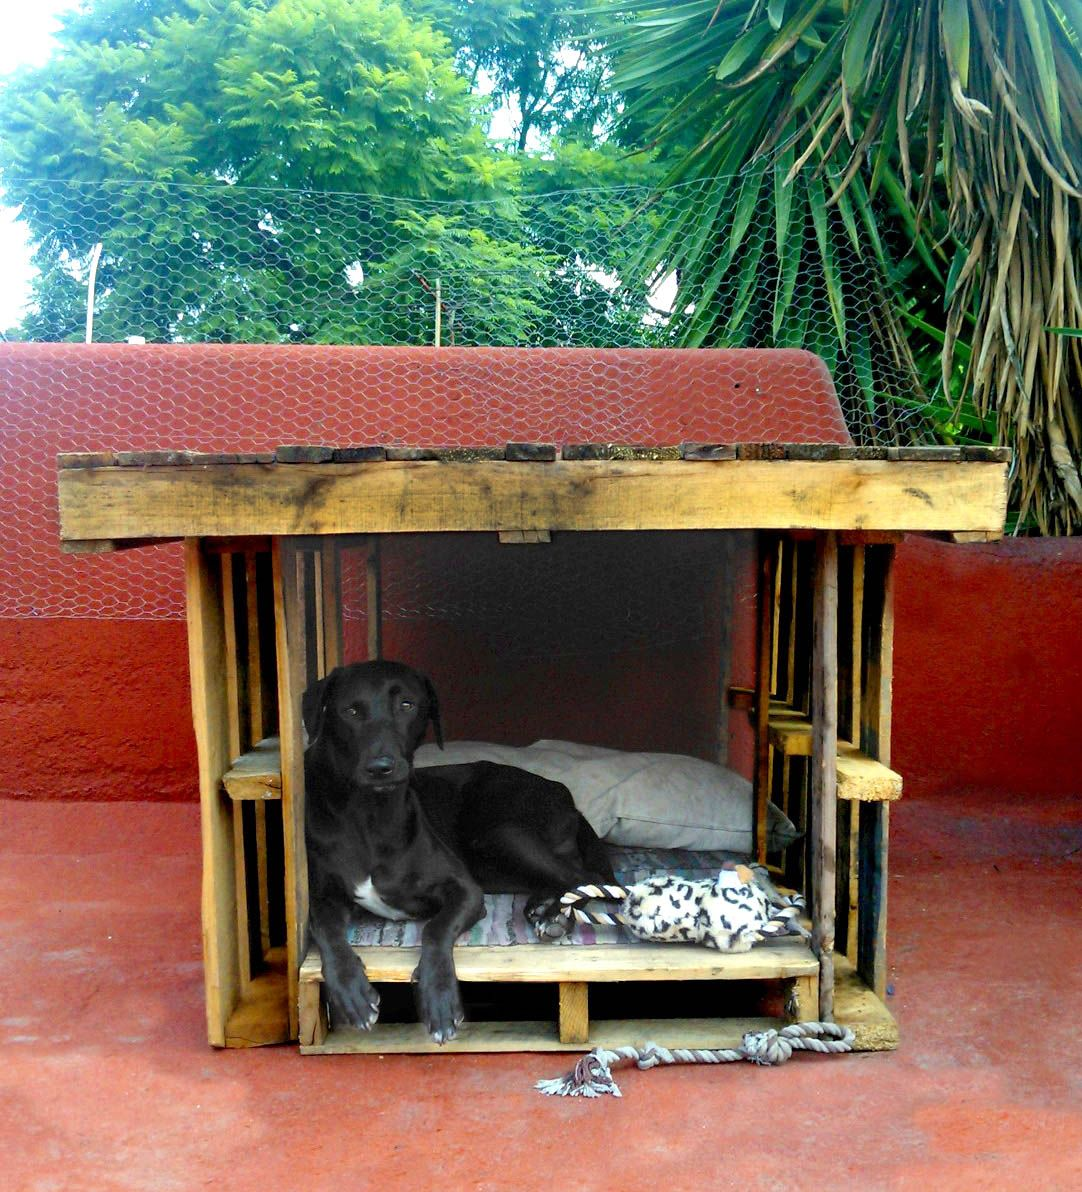 Casa de perro yea pinterest casa de perro casas for Construir casa de perro